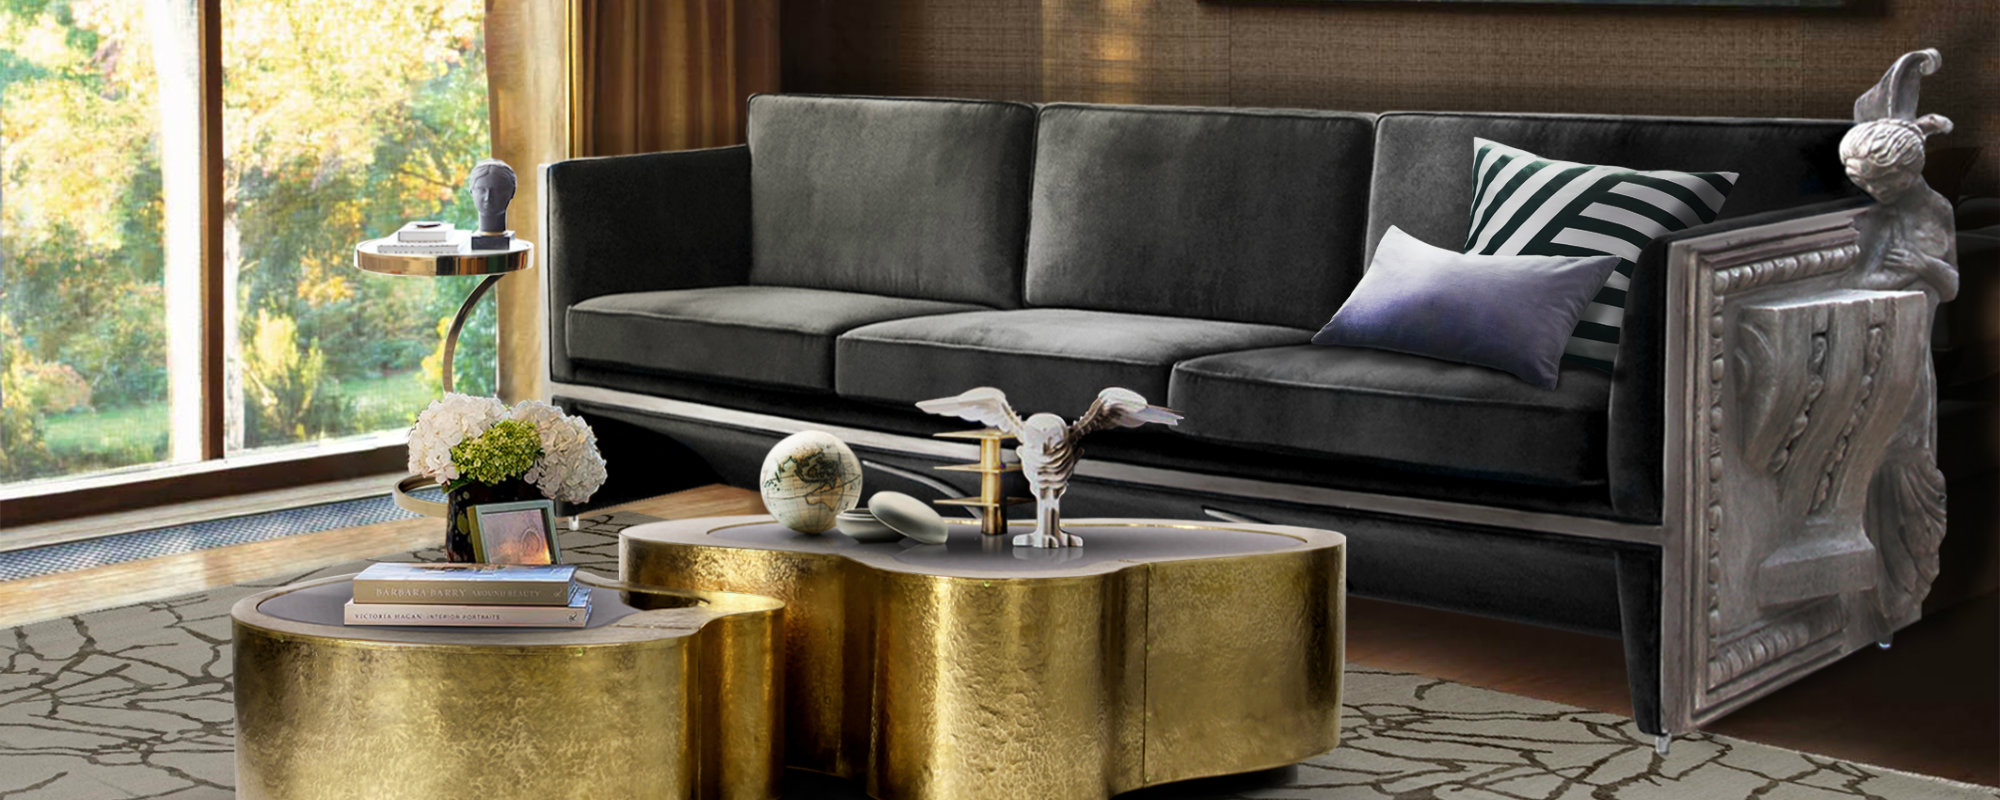 Tendencias de Decoración: Ideas para tú sala de estar tendencias de decoración Tendencias de Decoración: Ideas para tú sala de estar Featured 5